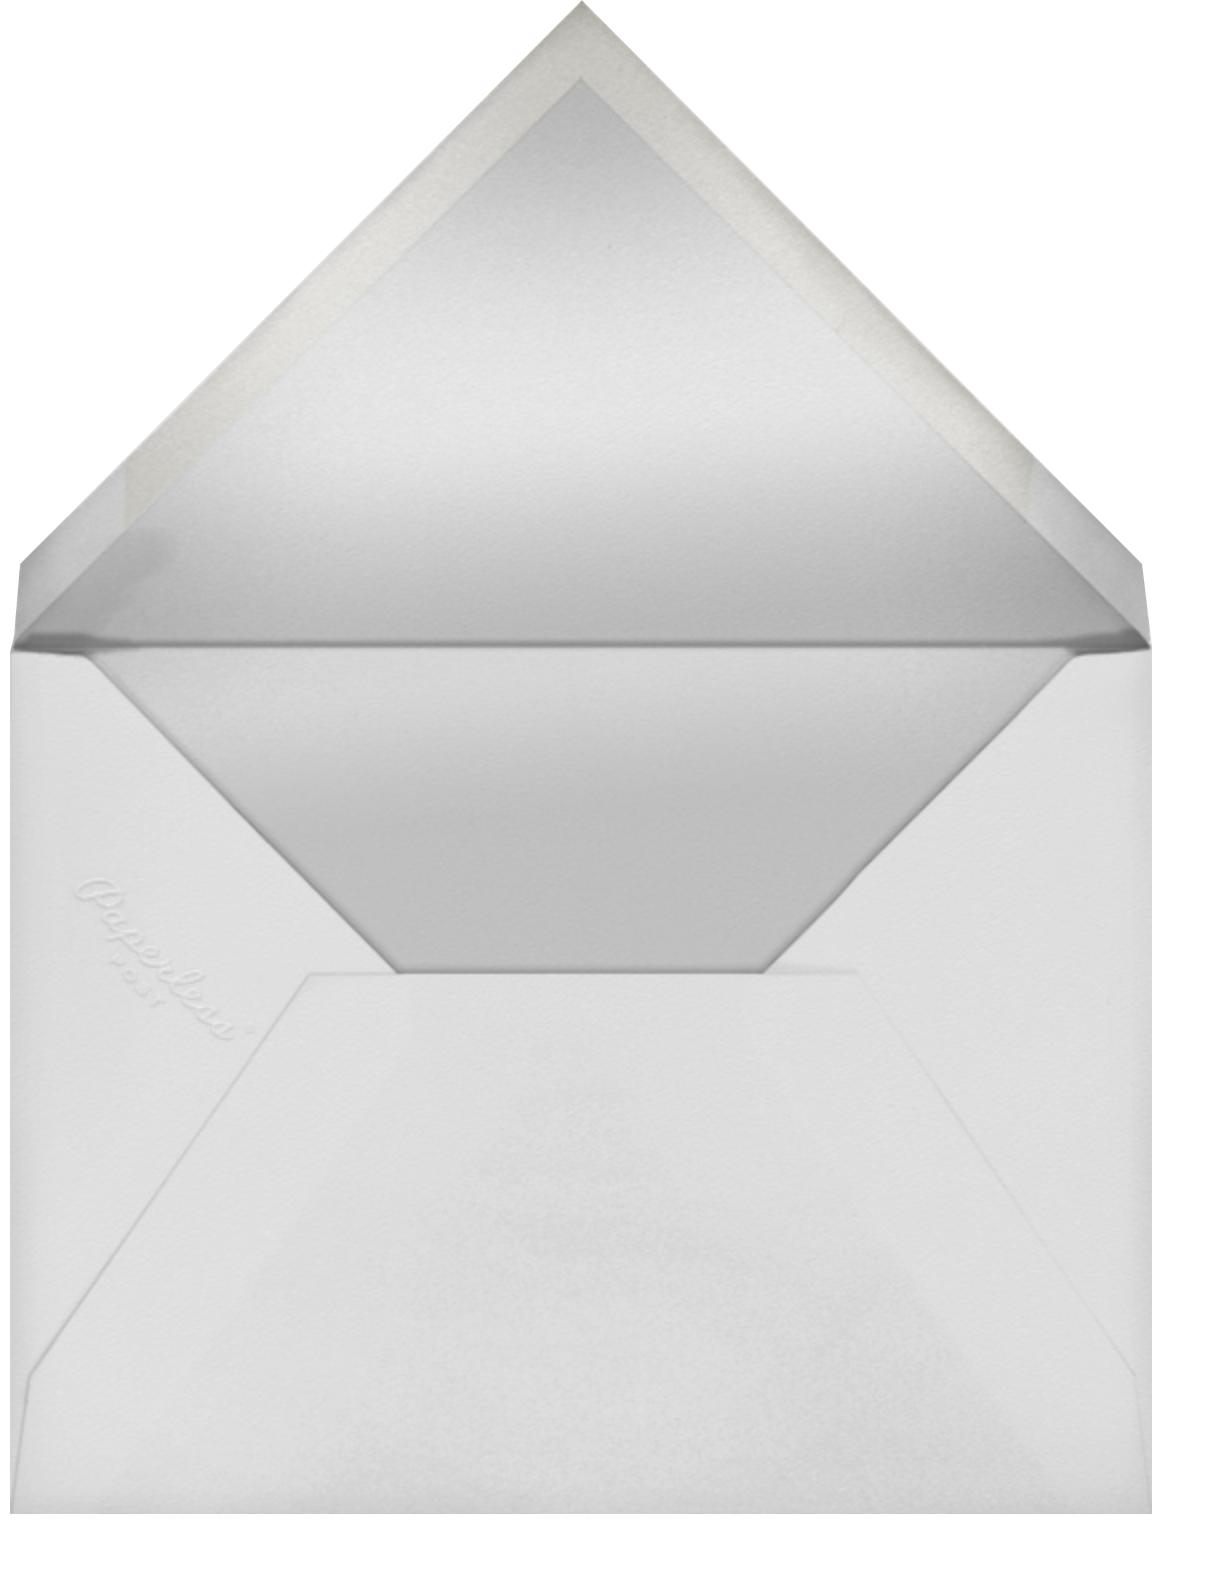 Hello Dahling - Paperless Post - Envelope